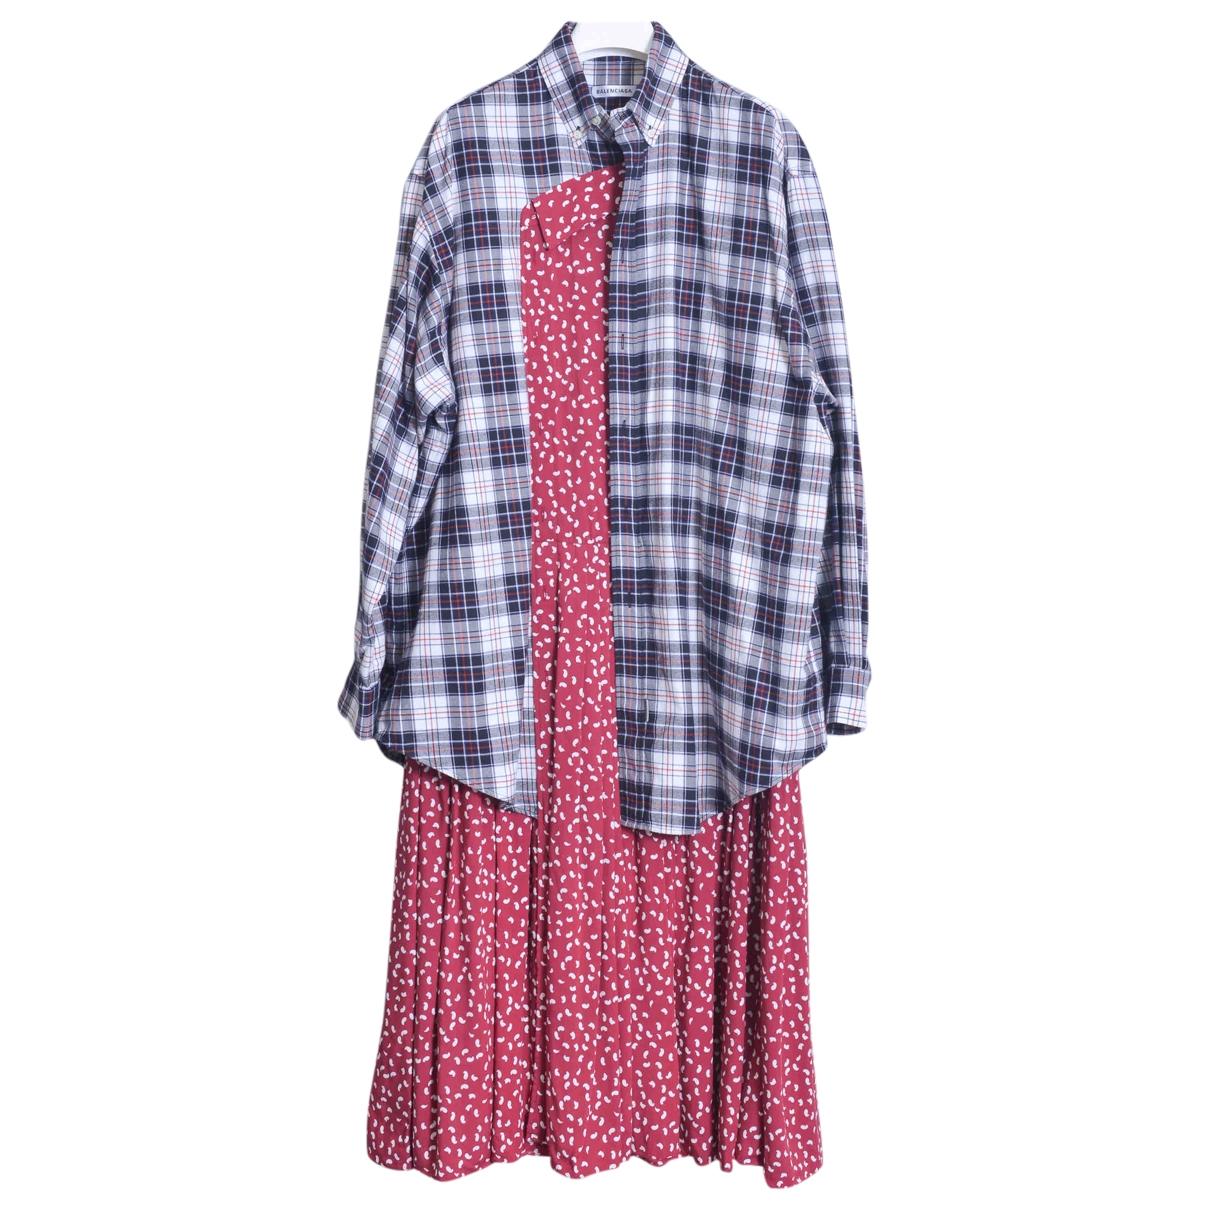 Balenciaga \N Kleid in  Bunt Baumwolle